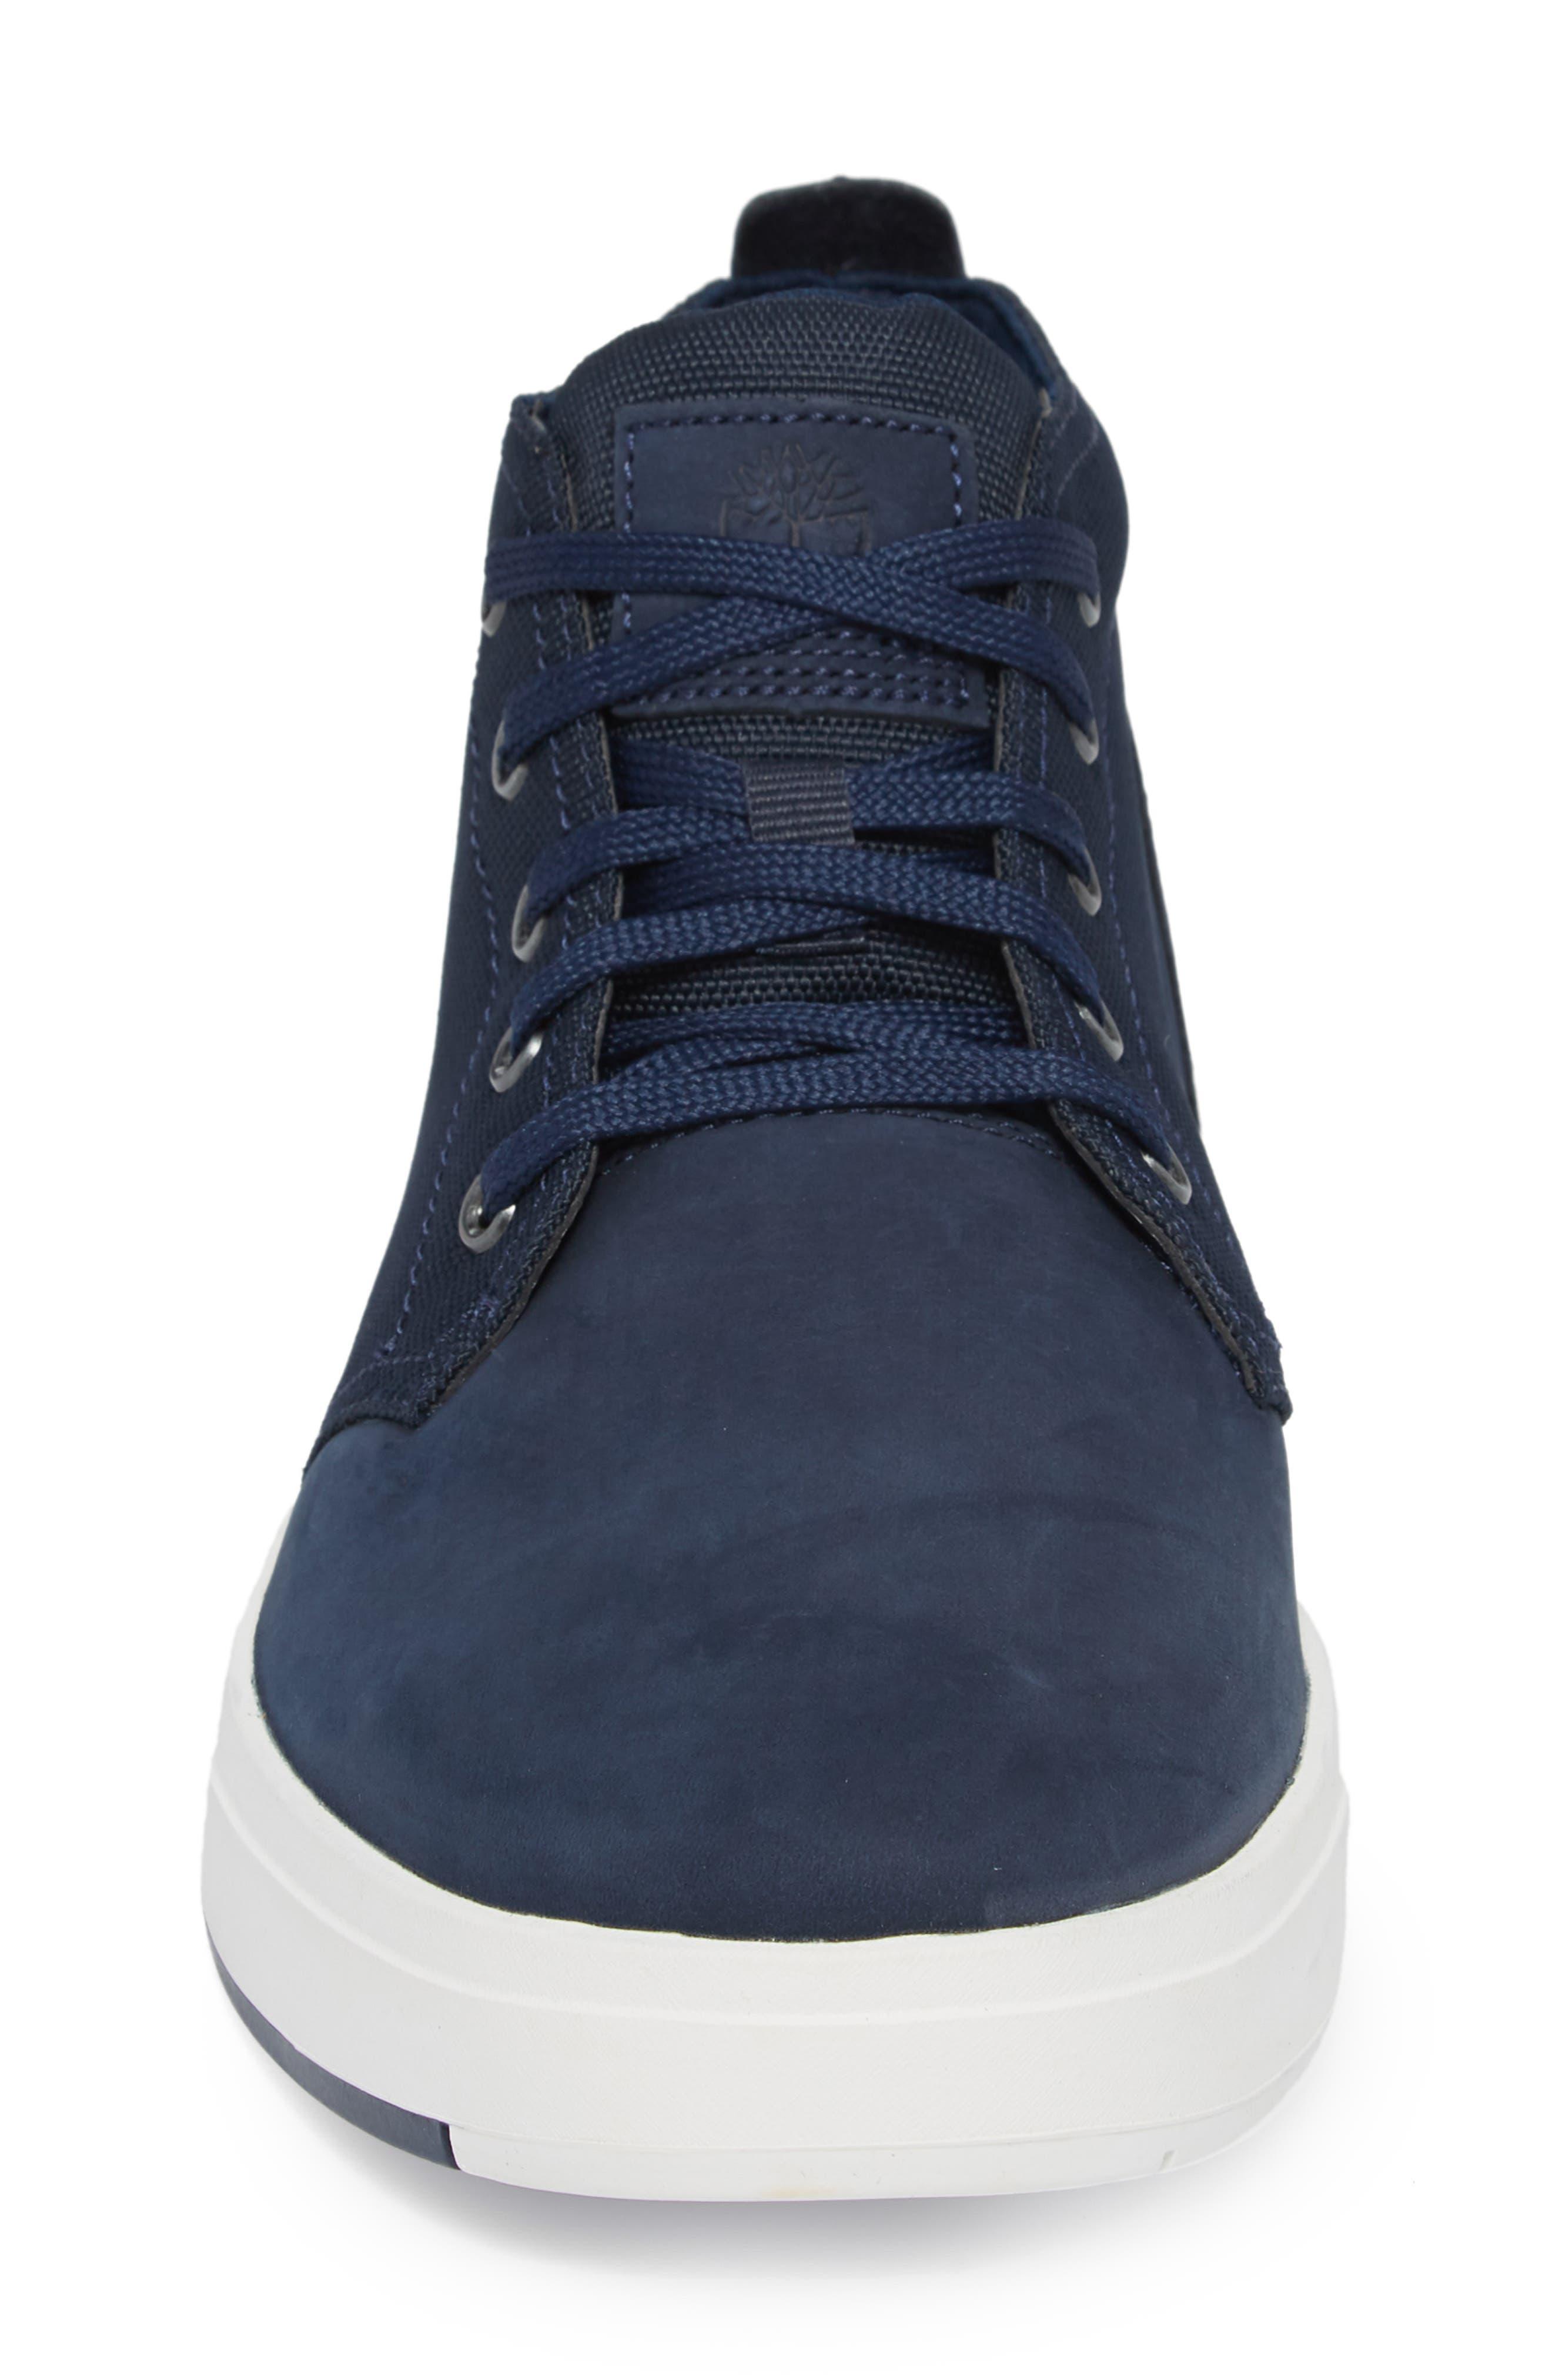 Davis Square Mid Top Sneaker,                             Alternate thumbnail 5, color,                             Black/ Blue